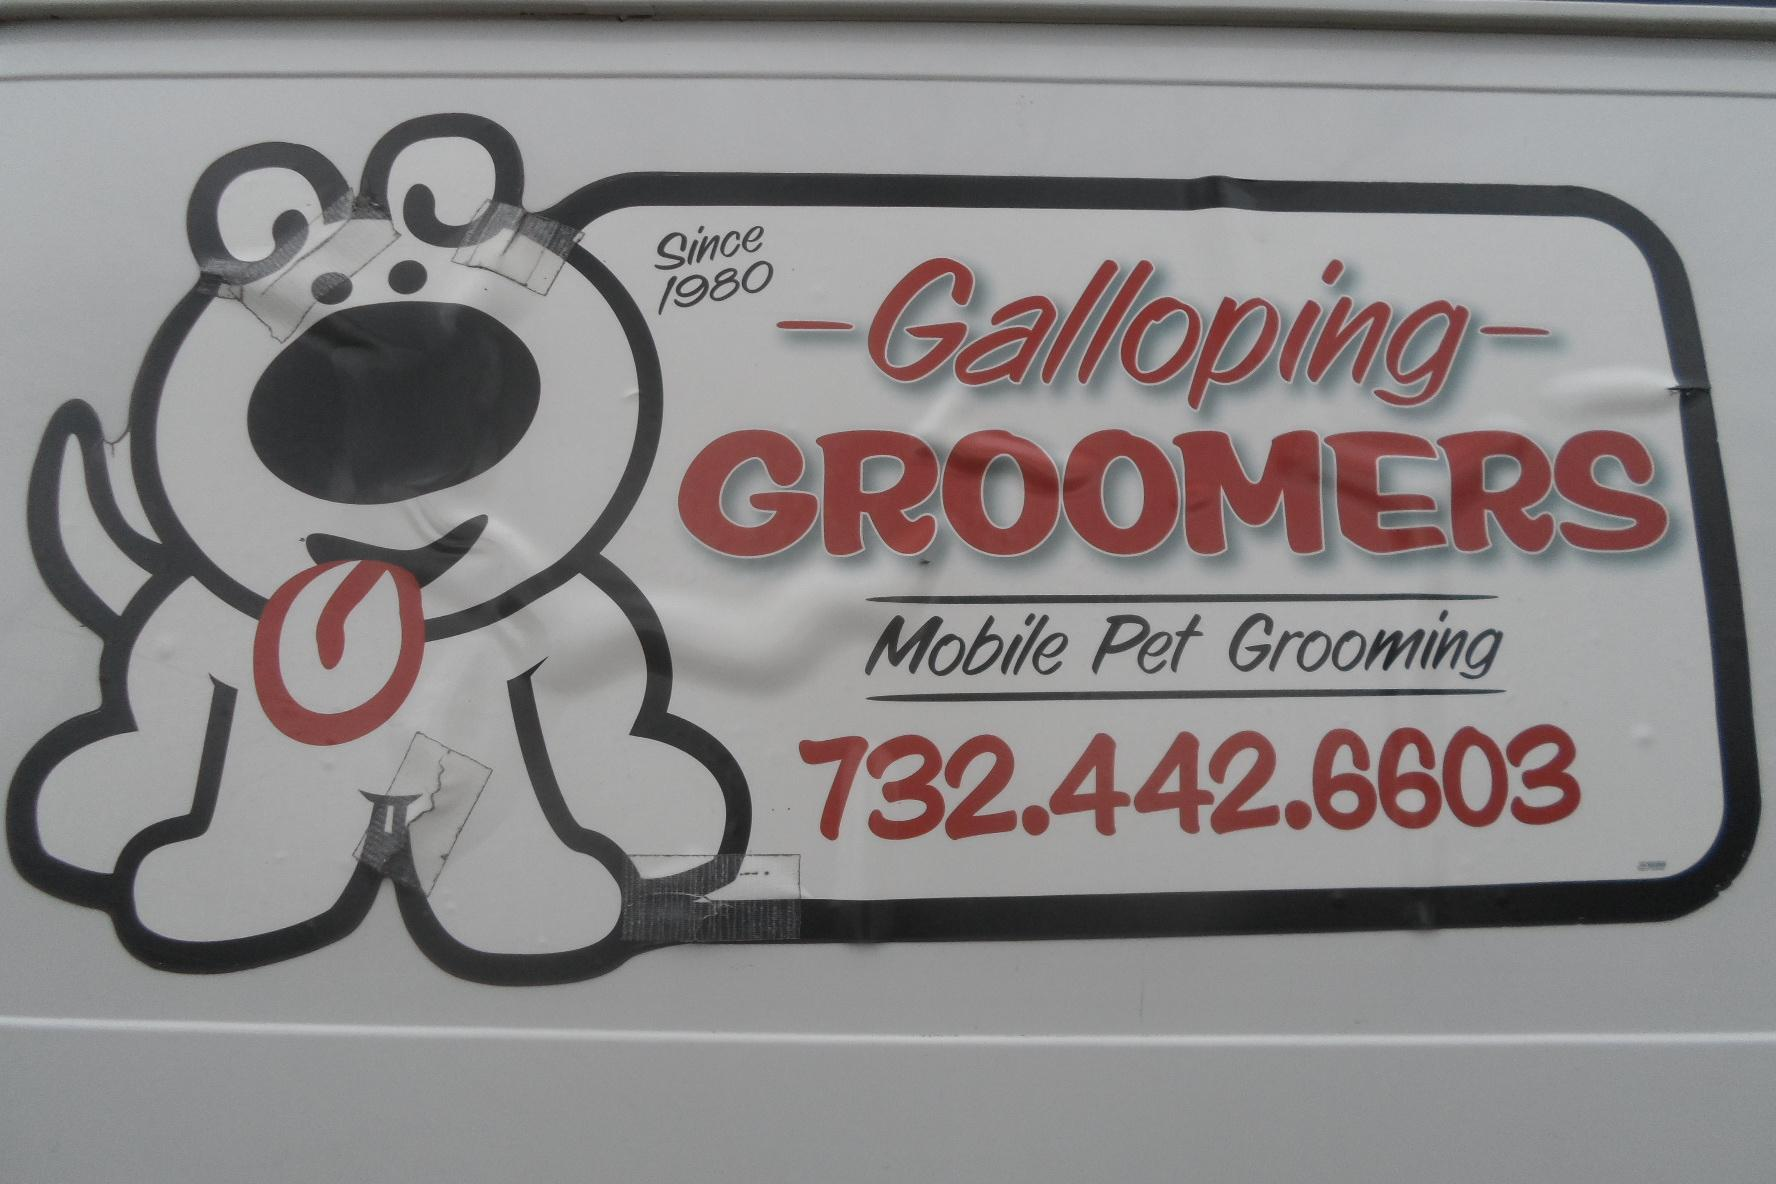 Galloping Groomers